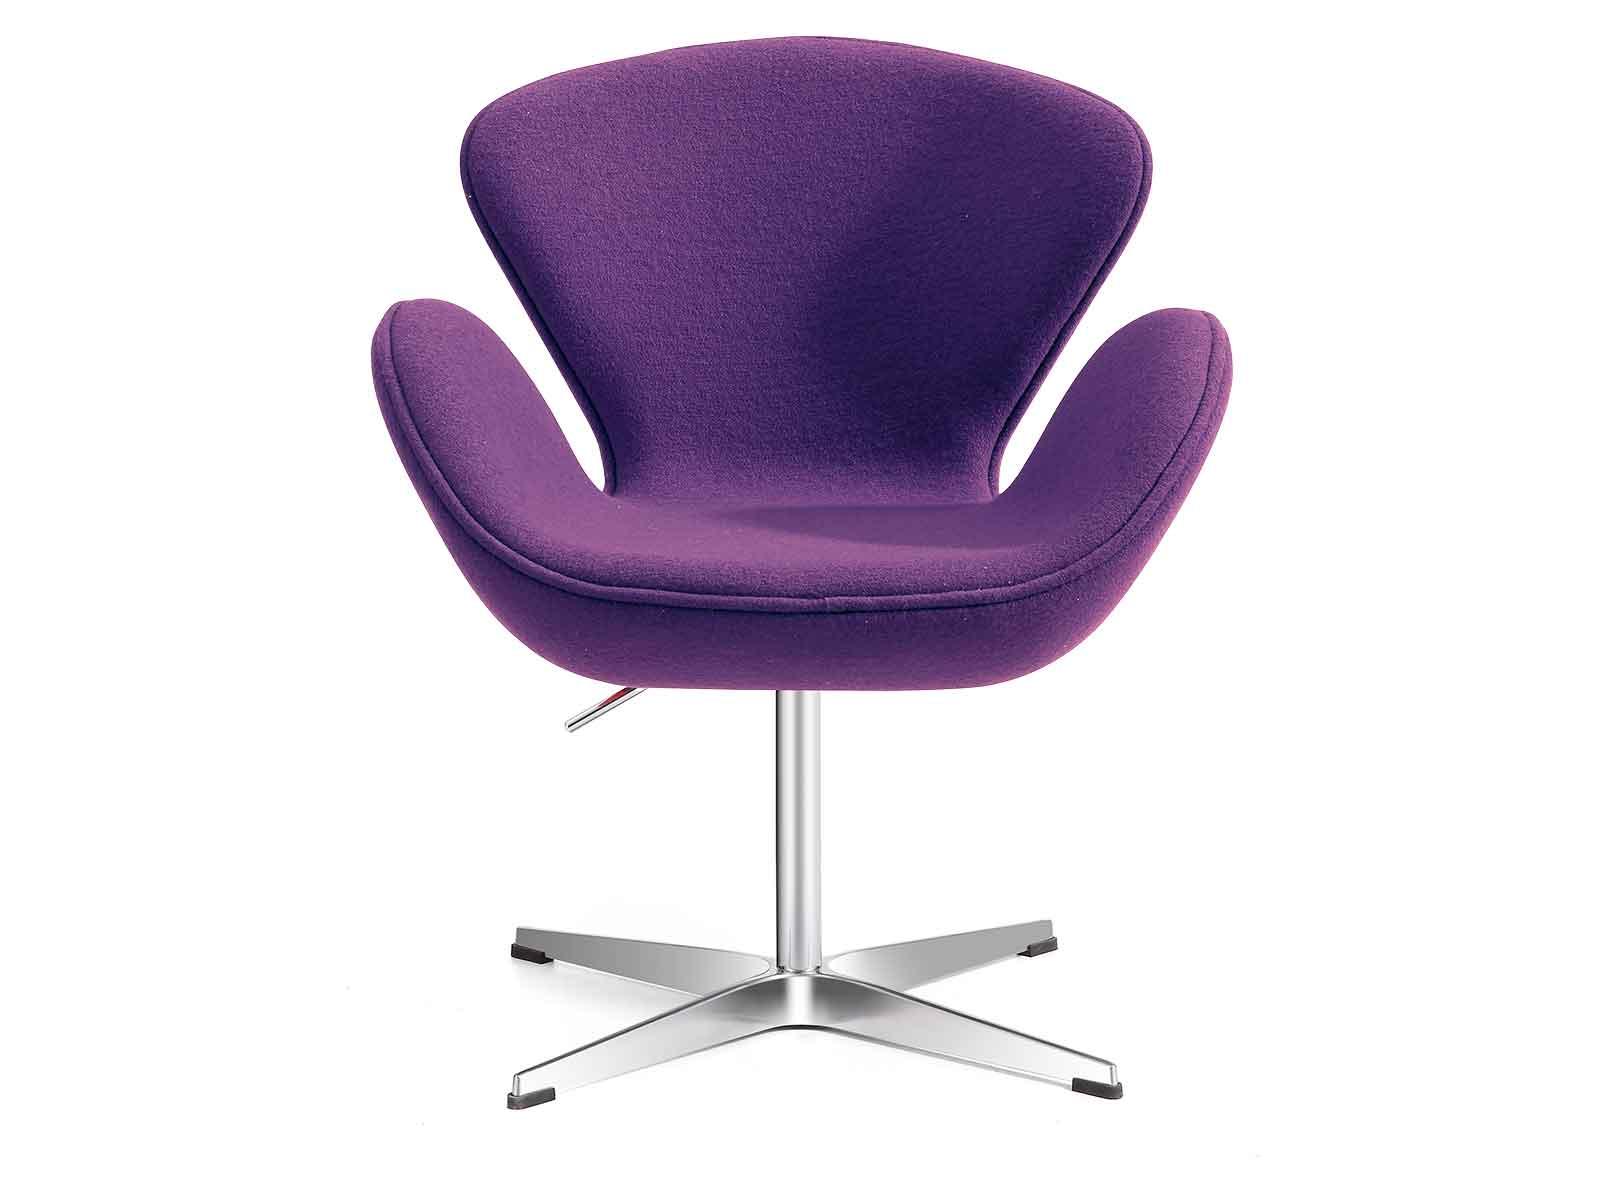 Silla sidney morado casam a design compra sillas for Sillas modernas online